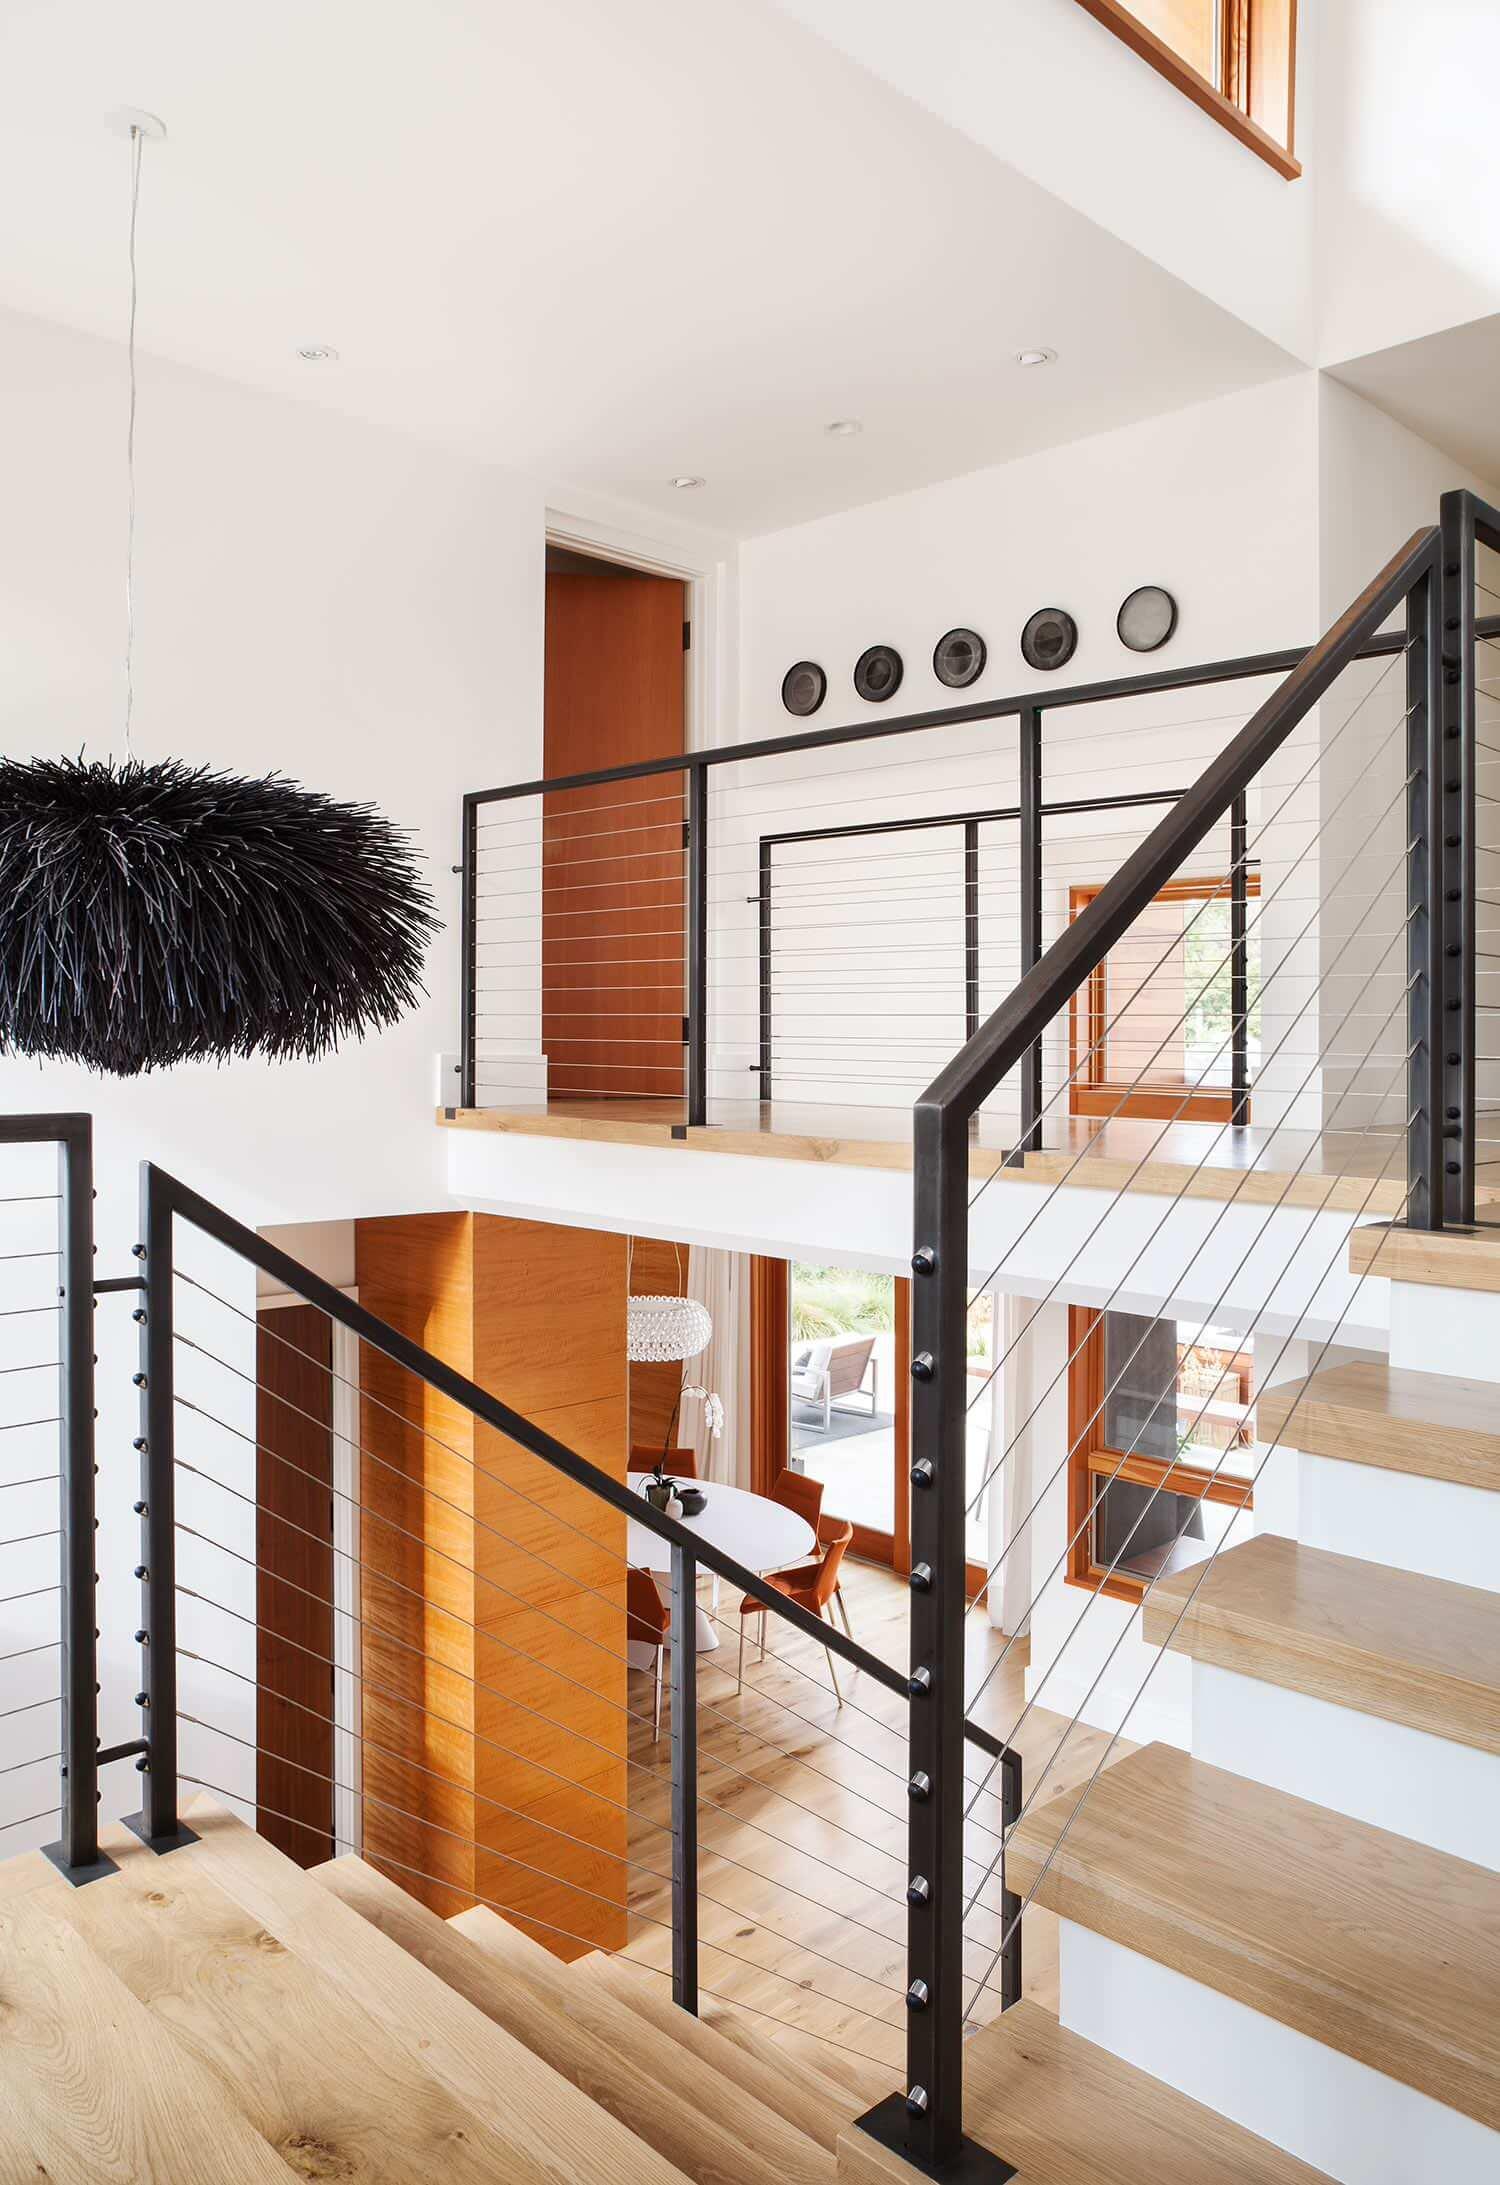 los-altos-house-dotter-solfjeld-architecture-04